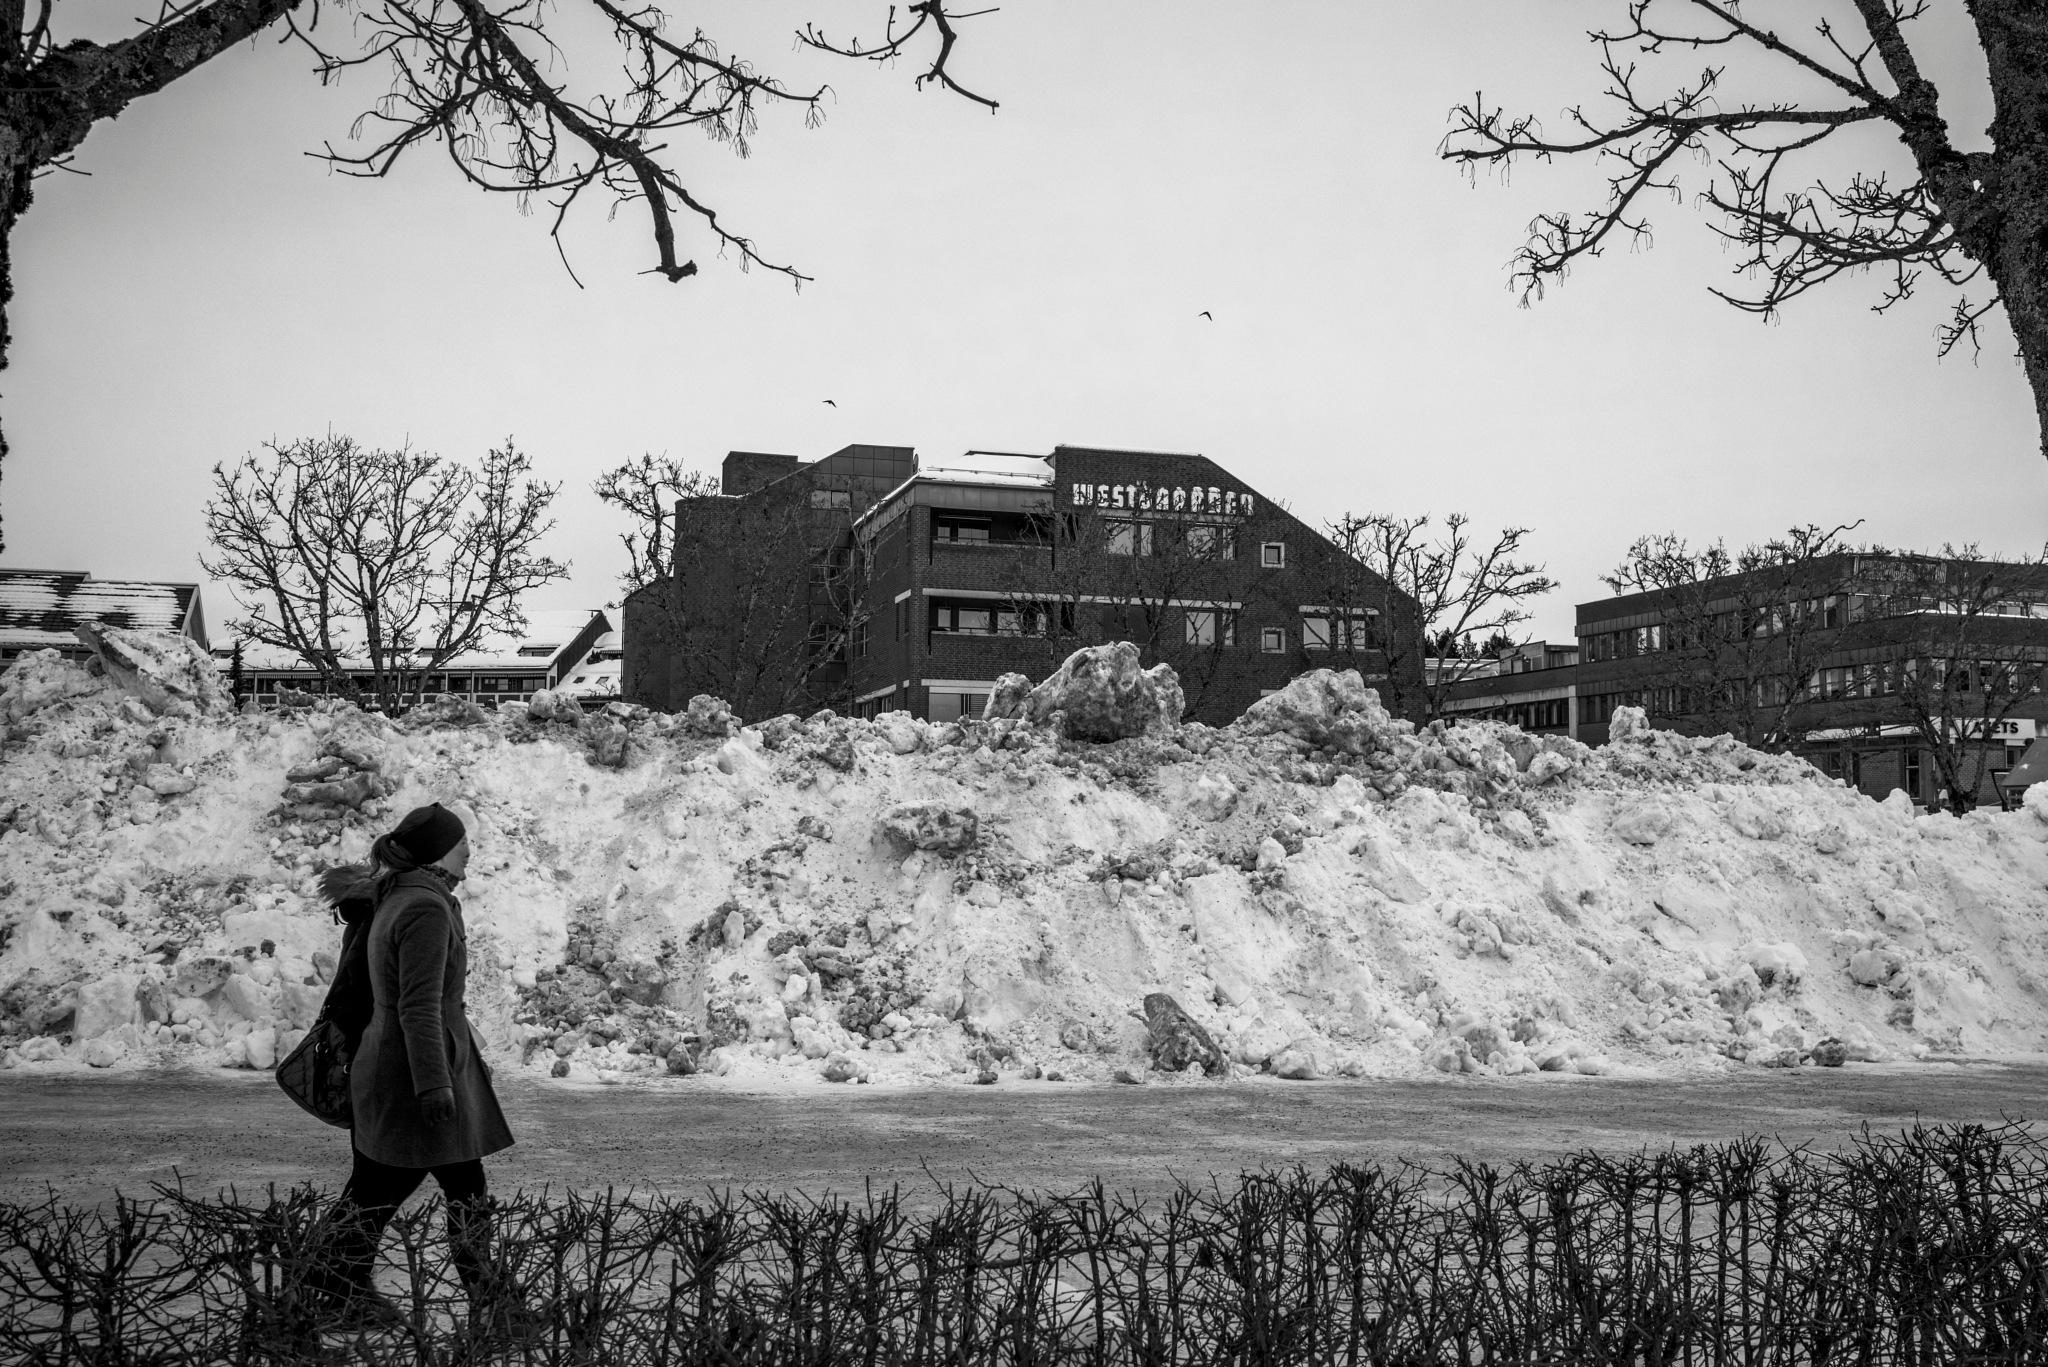 Snowy Streets in Norway by Goran Jorganovich